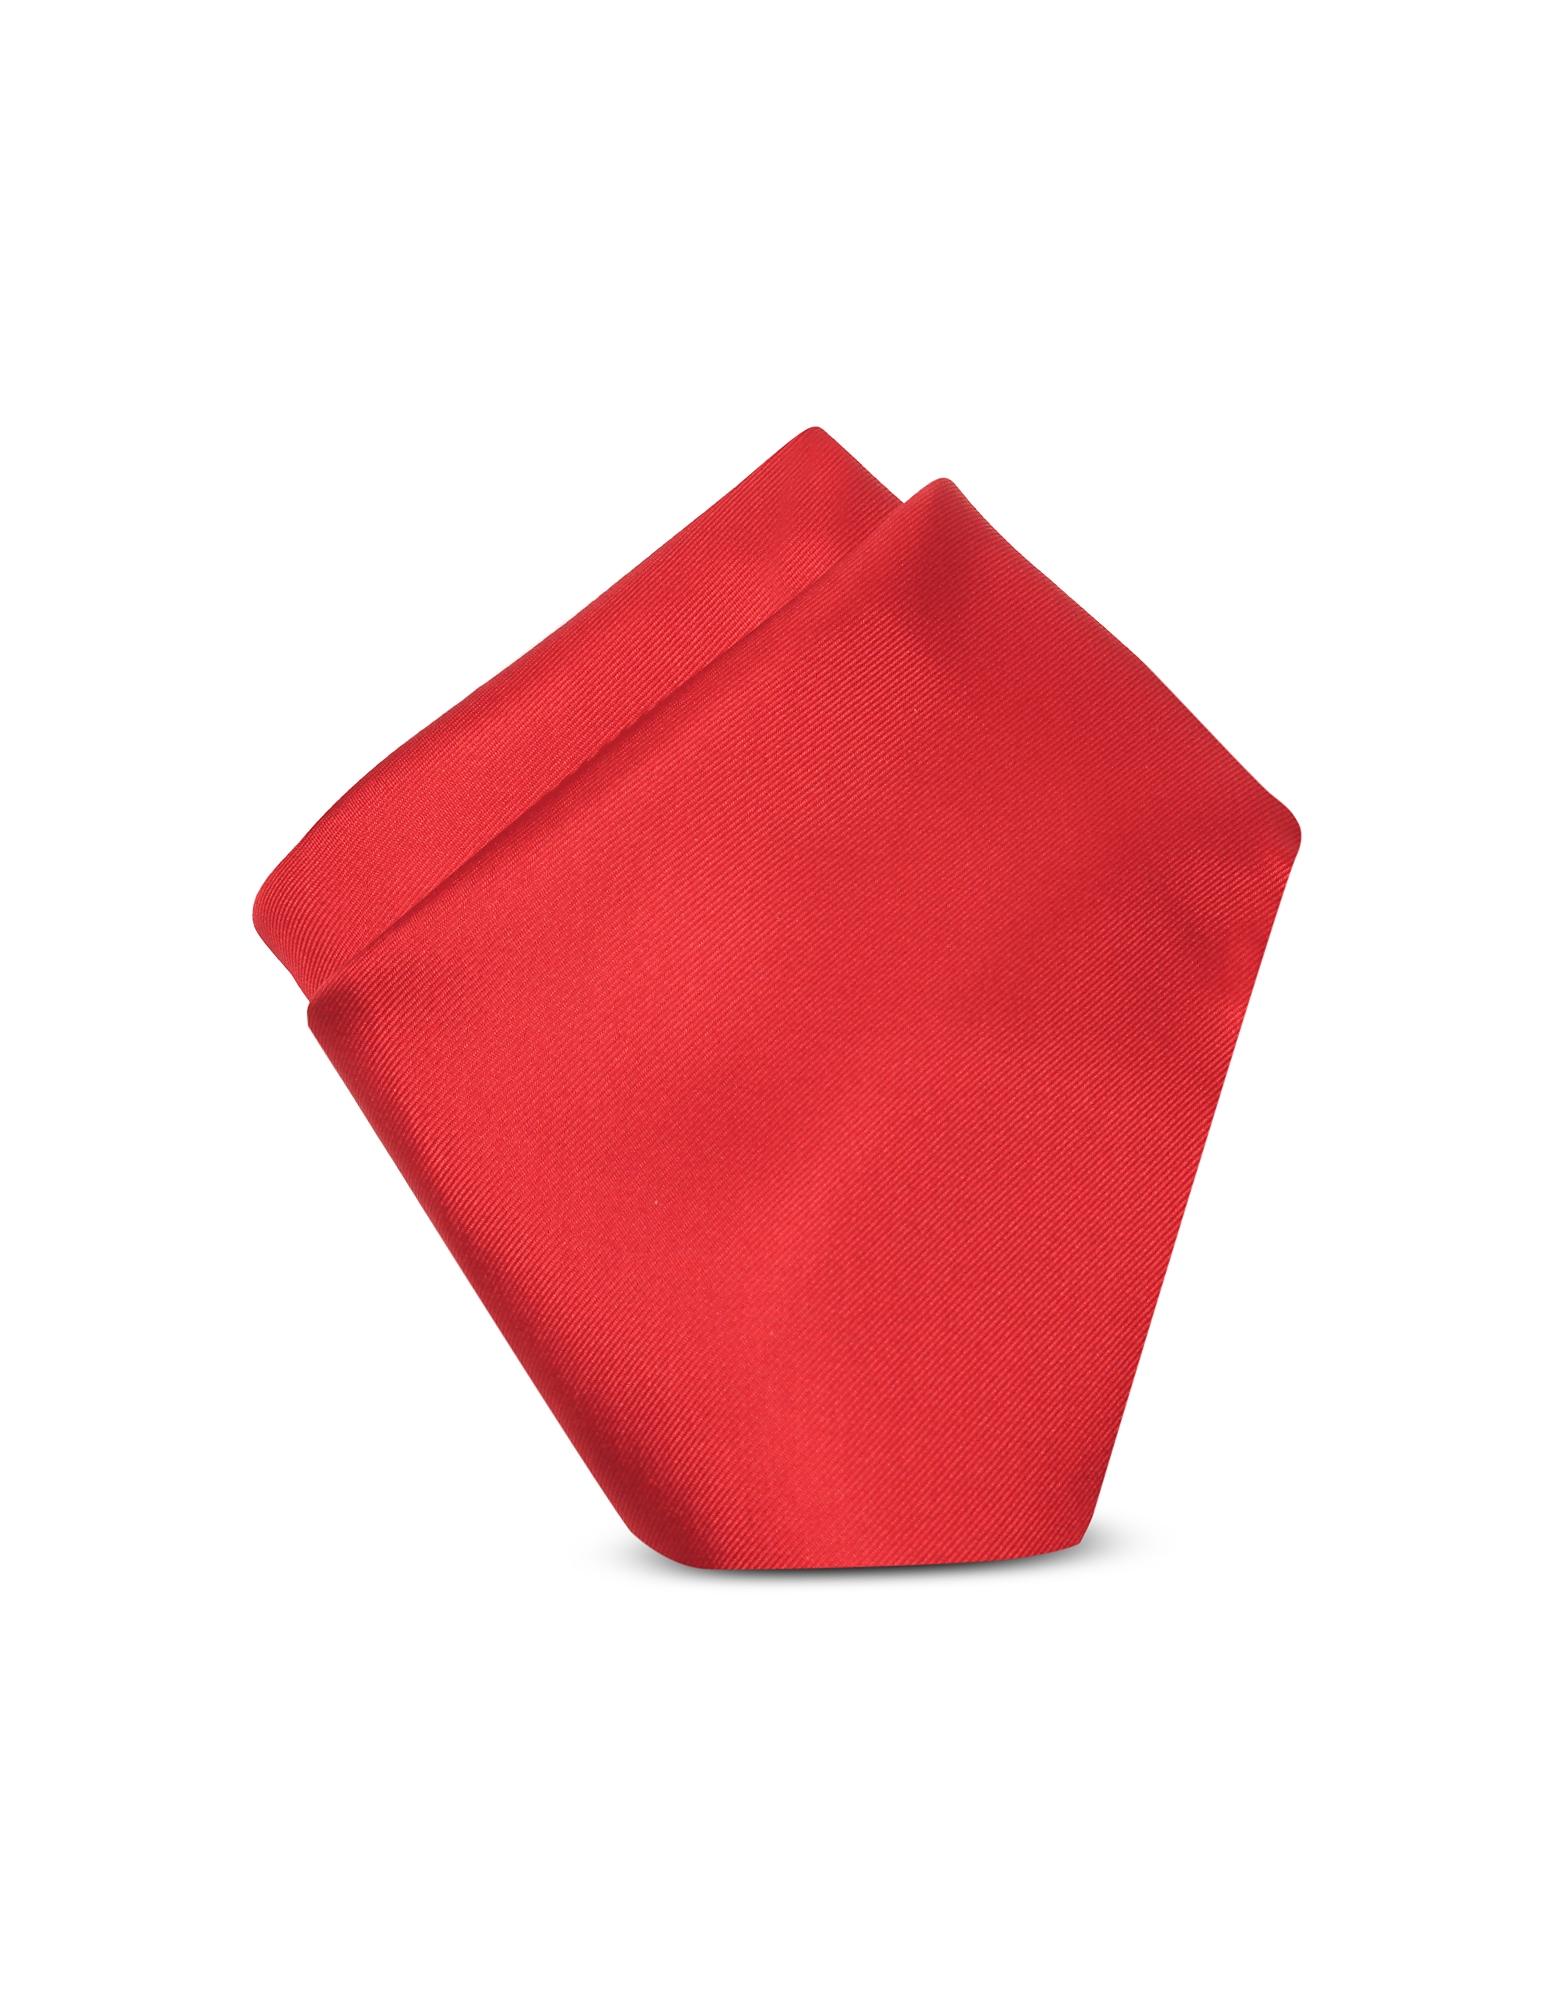 Forzieri Designer Handkerchiefs, Red Silk Pocket Square